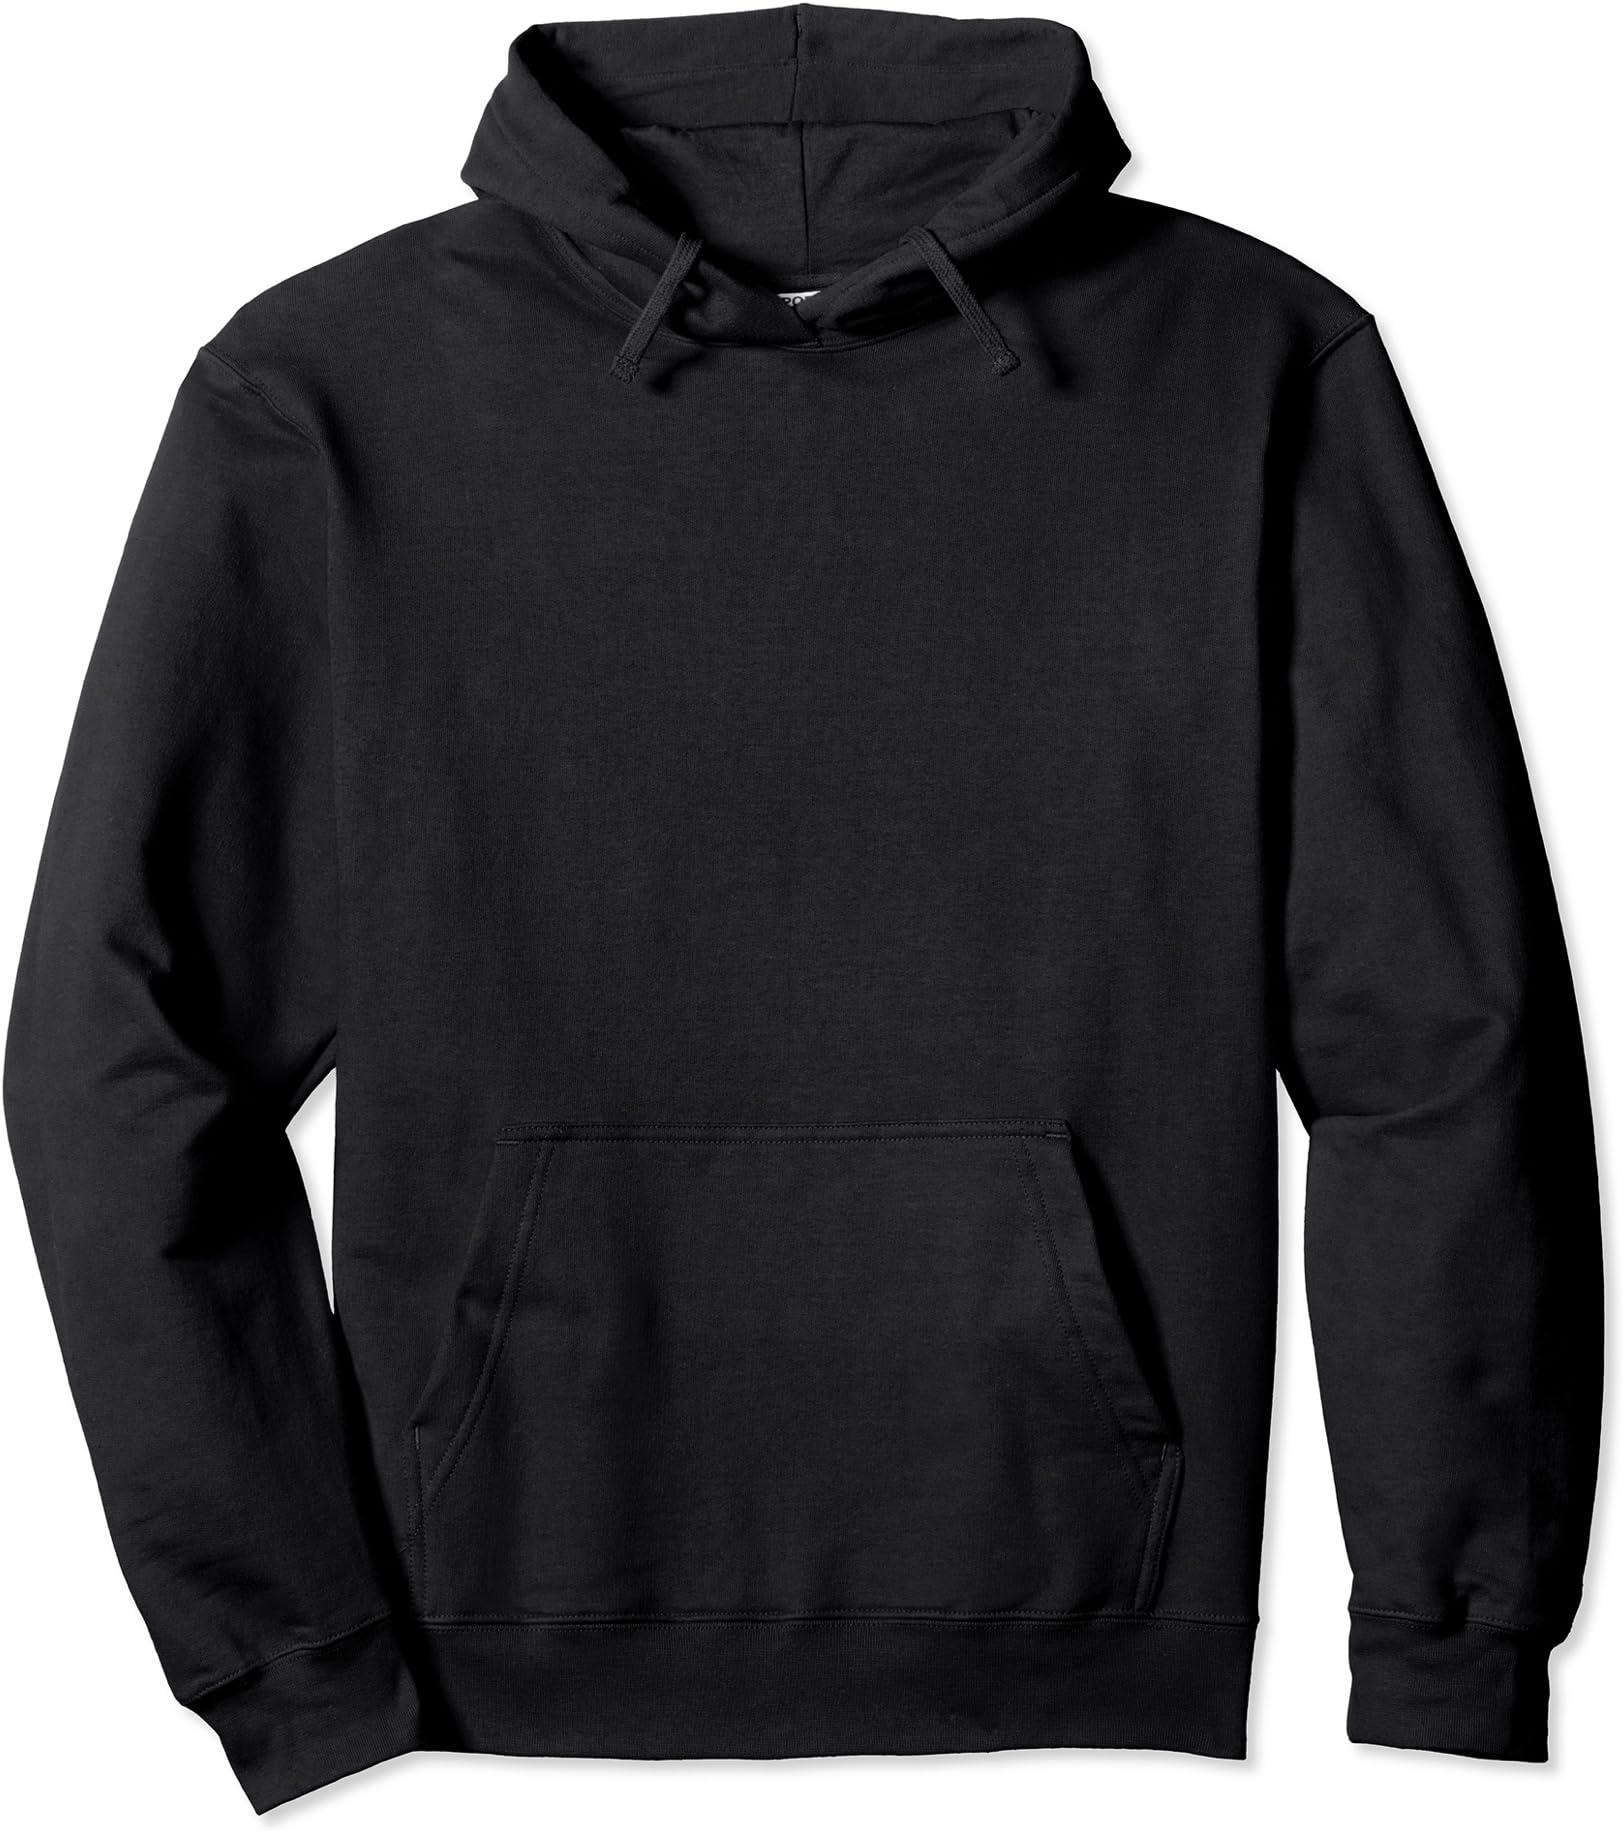 Pitbull Lives Matter Adult Mens Casual Long Sleeve Hoody T-Shirt